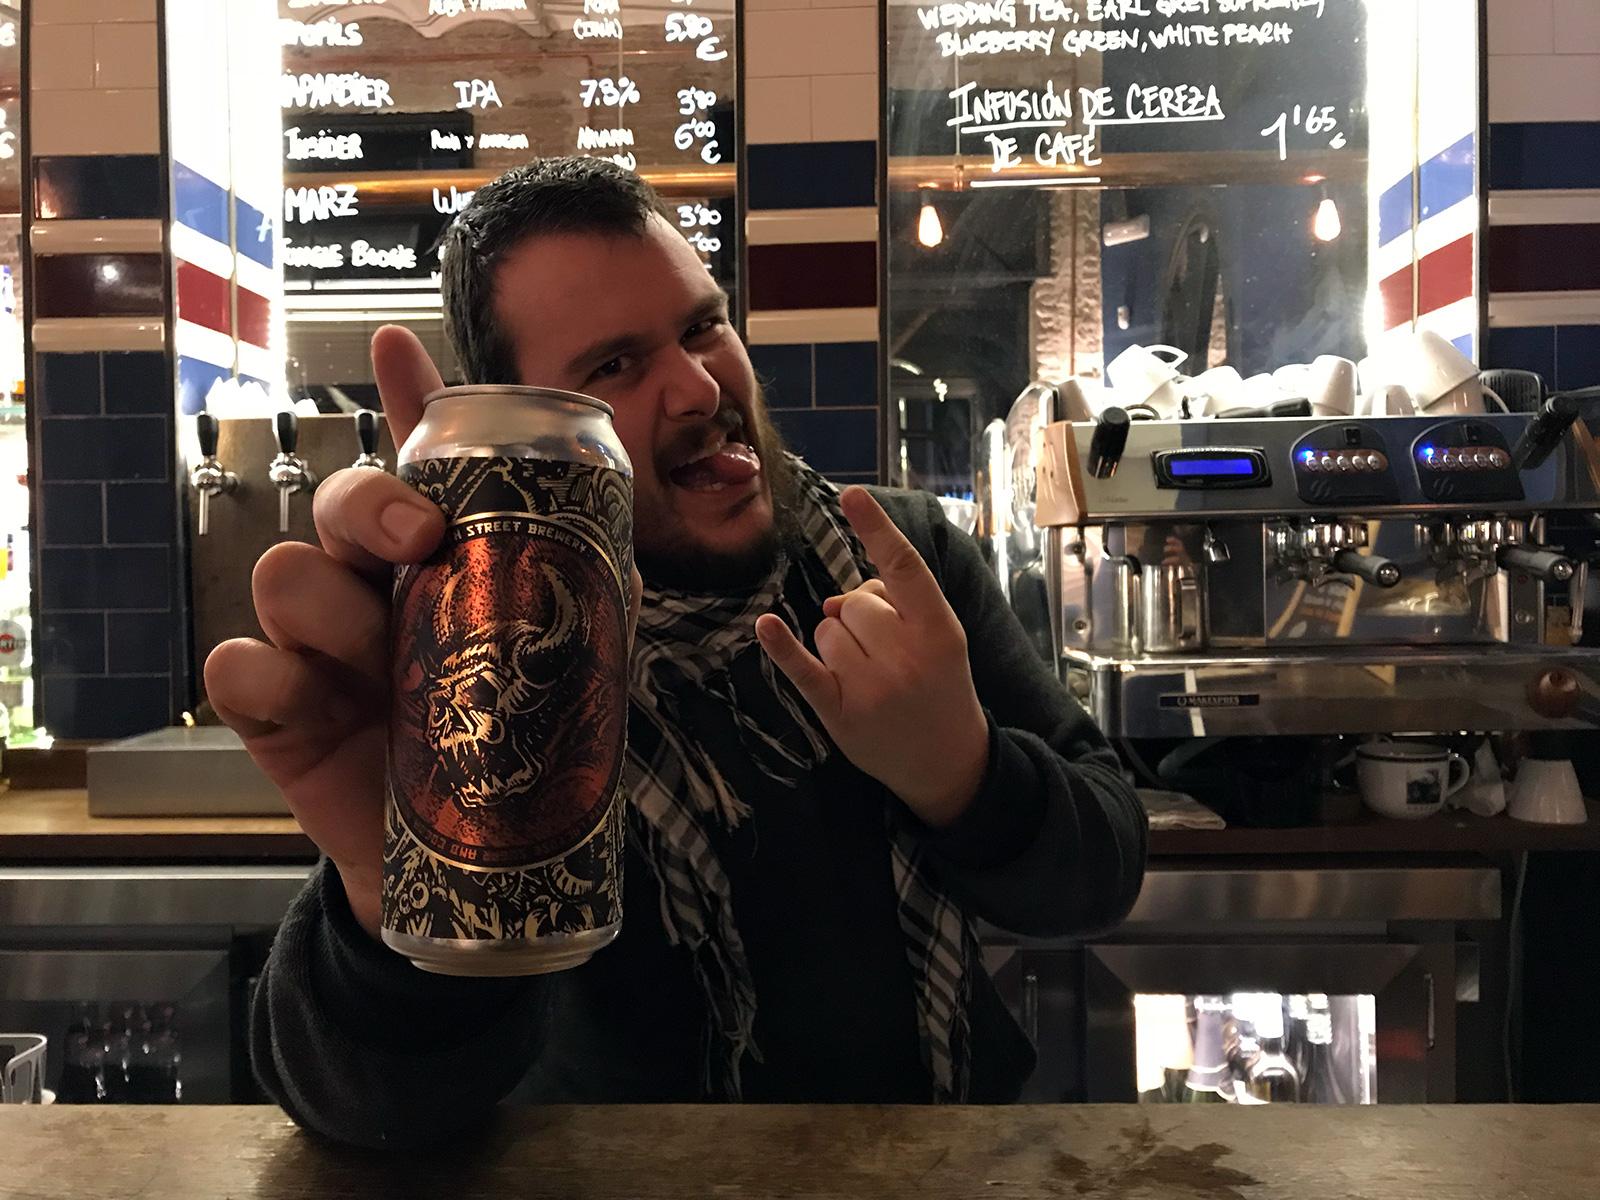 Bier Kraft in Seville, Spain by Jets Like Taxis / Hopsmash